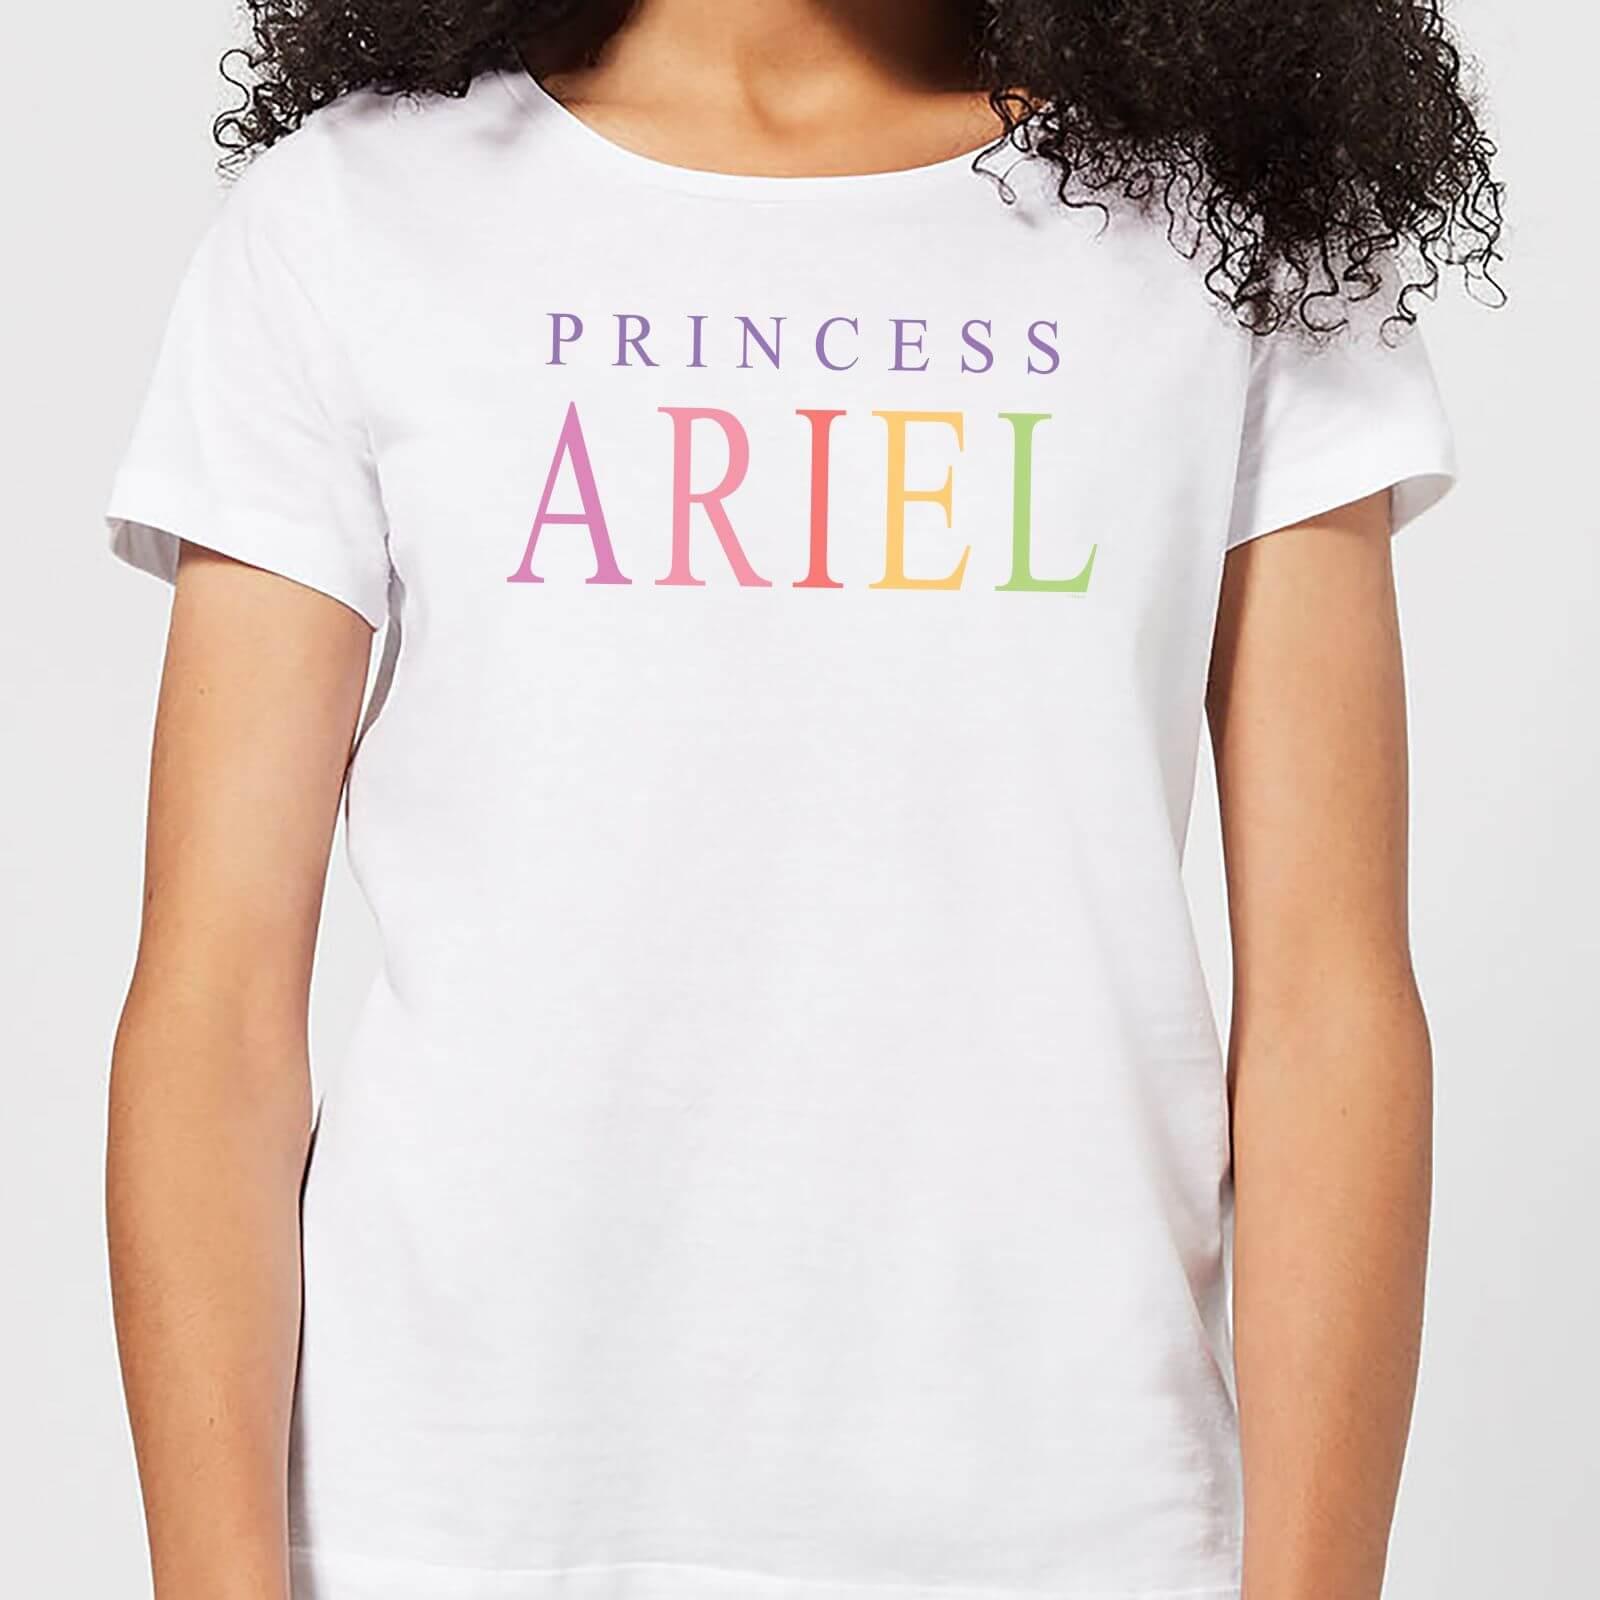 Disney Disney The Little Mermaid Princess Ariel Women's T-Shirt - White - 3XL - White